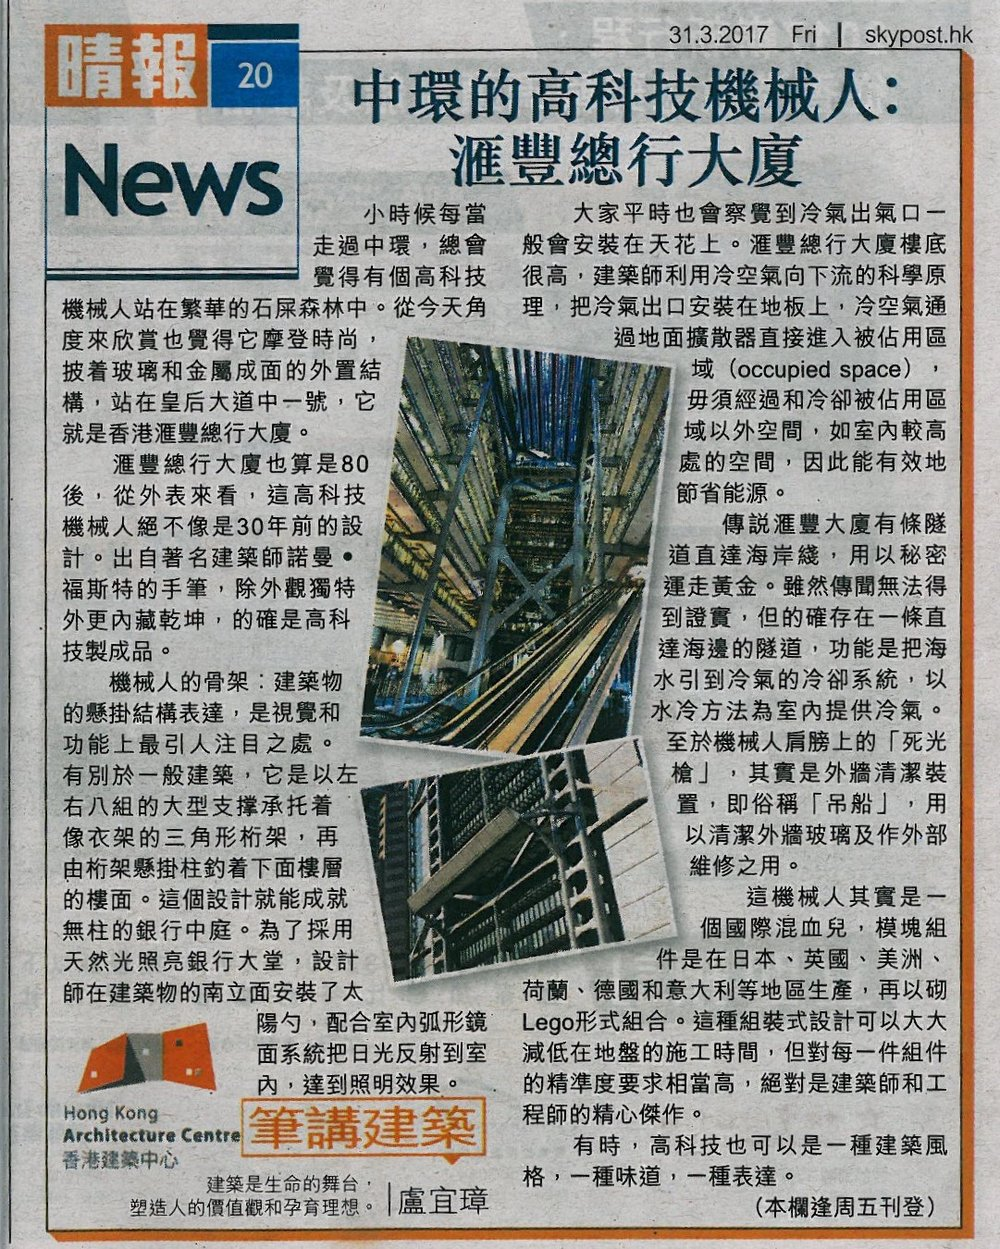 Skypost_170331_盧宜璋_中環的高科技機械人 - 香港匯豐銀行大廈.jpg